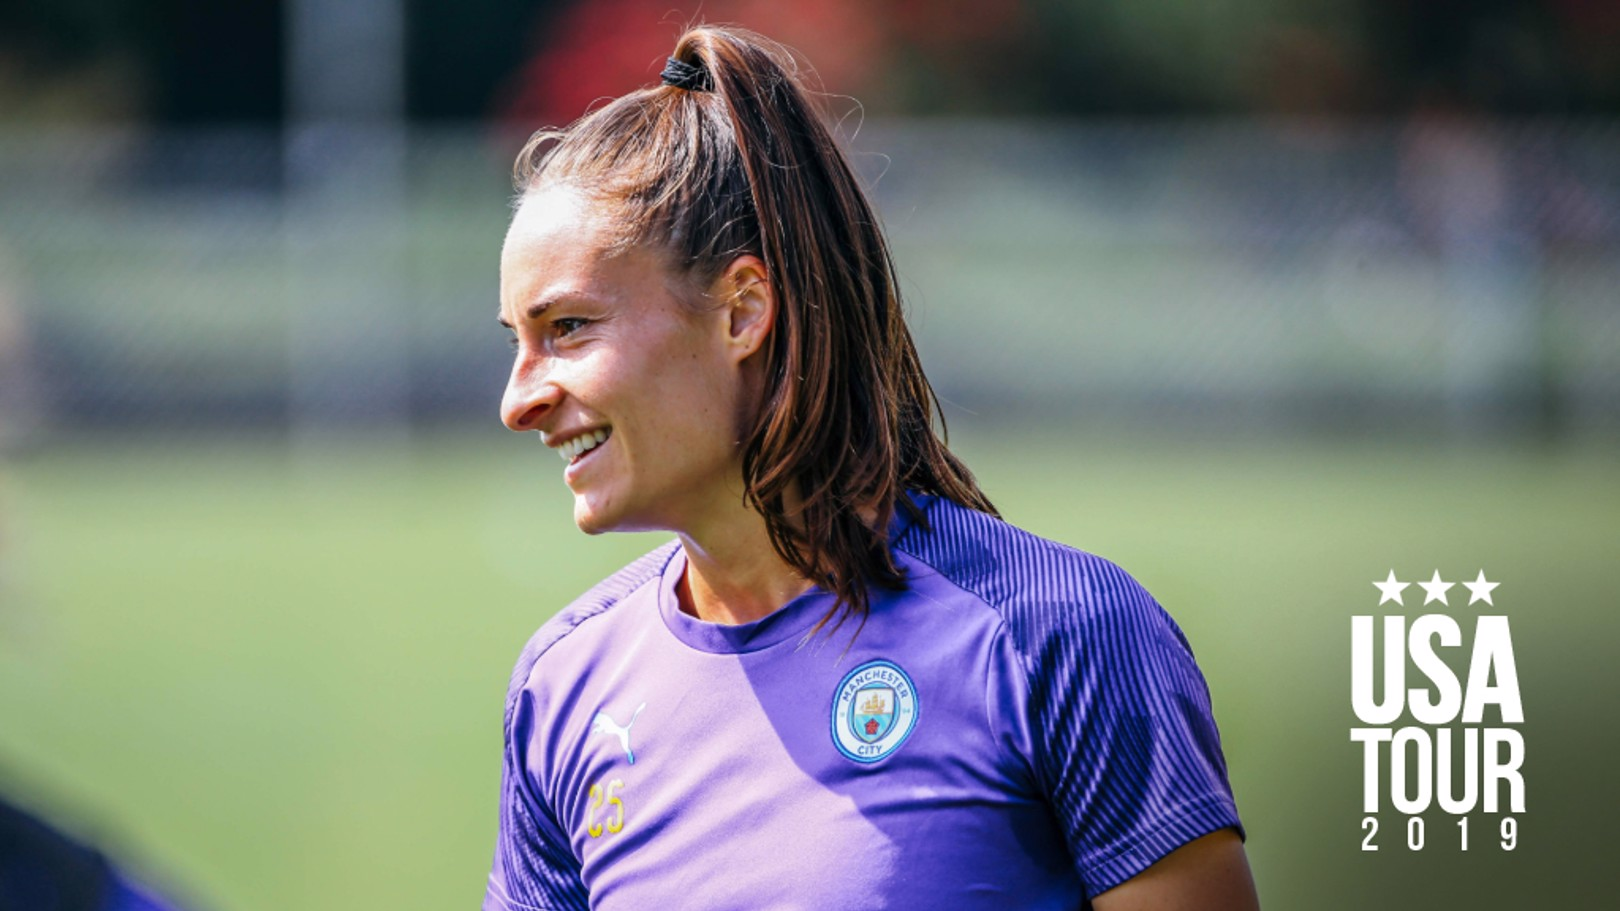 BELGIAN BLUE: Tessa Wullaert is enjoying the Women's International Champions Cup